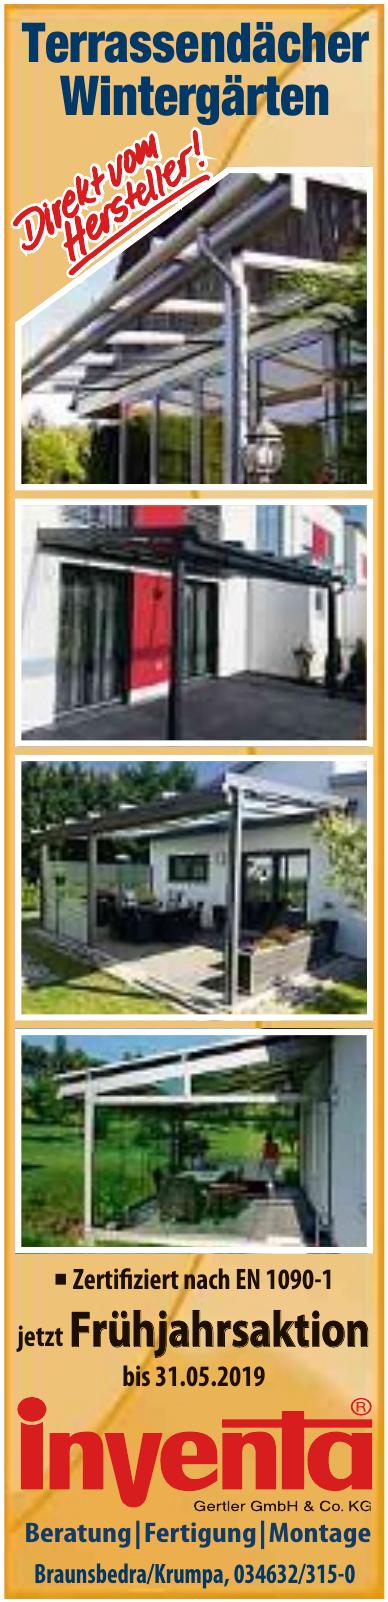 Inventa Gertler GmbH & Co. KG